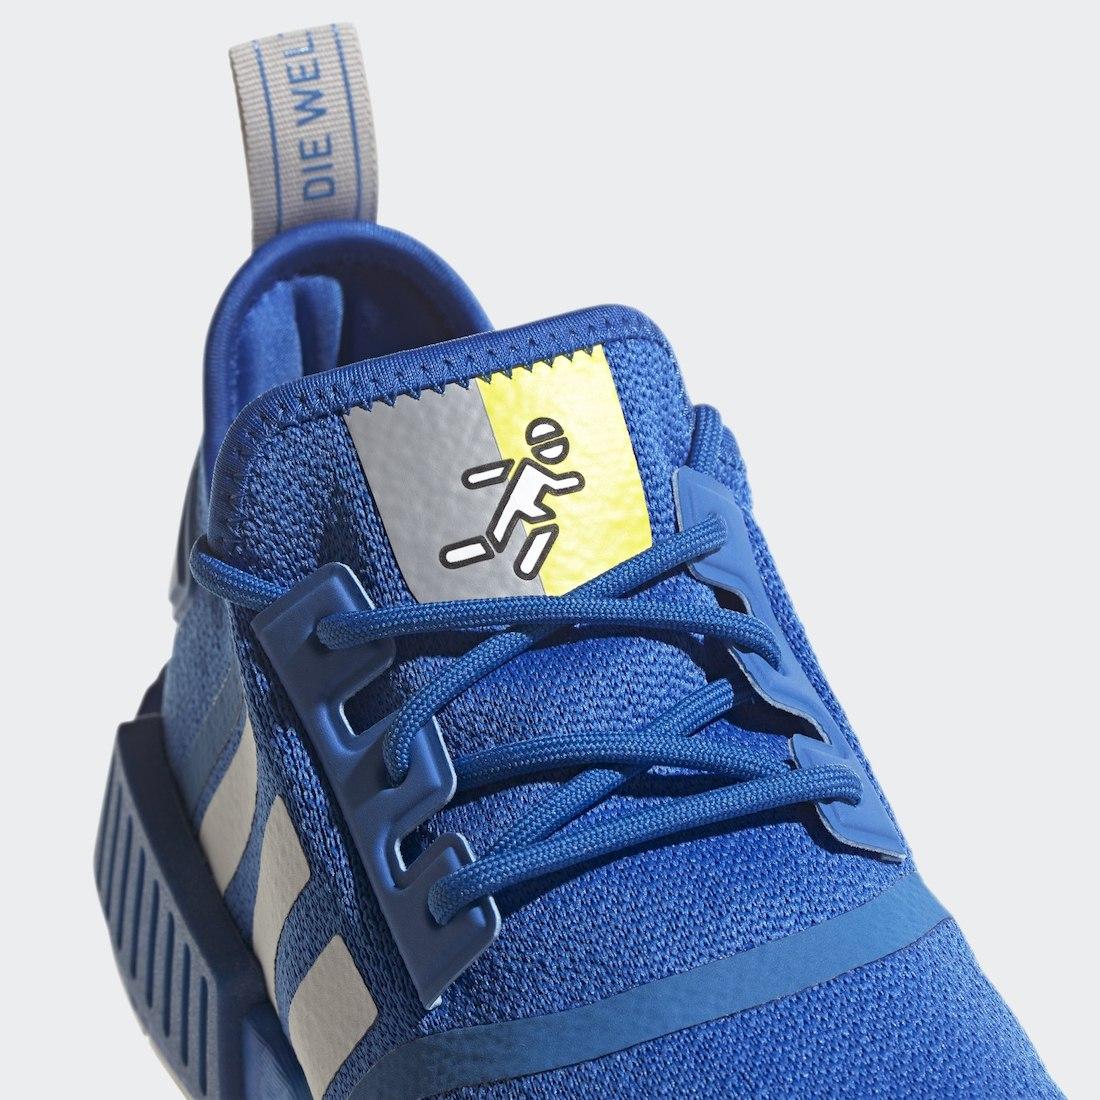 adidas NMD Blue Bird GY1349